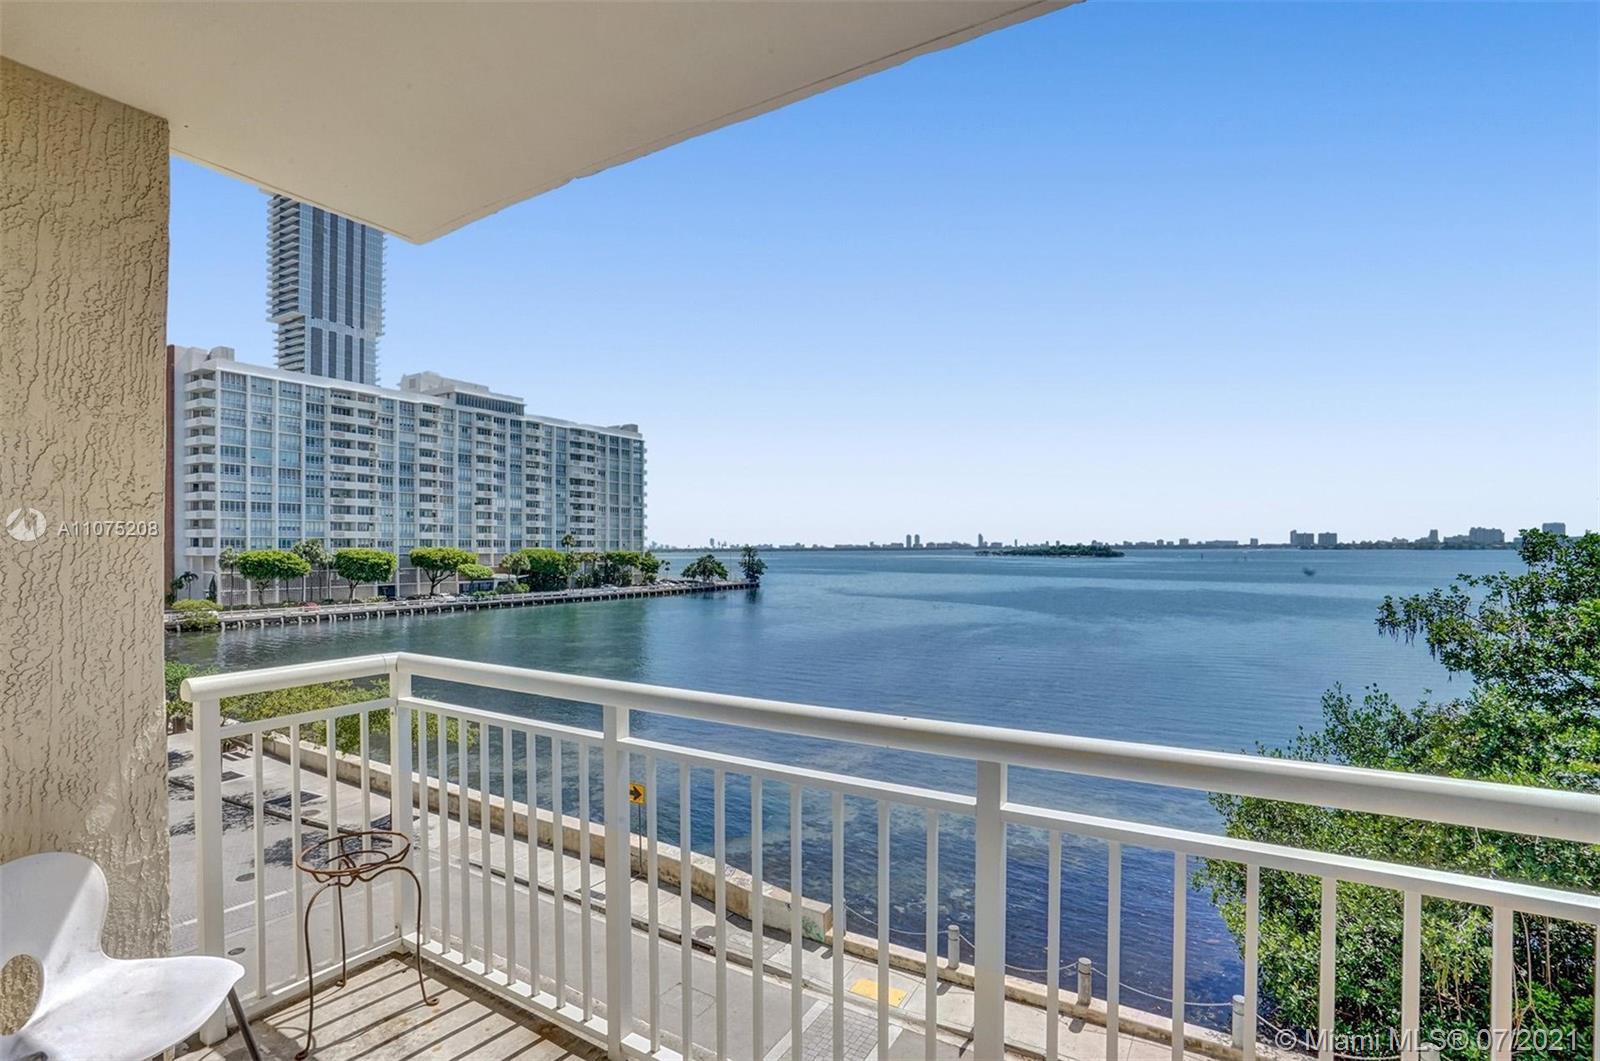 Cite East #321 - 2000 N Bayshore Dr #321, Miami, FL 33137